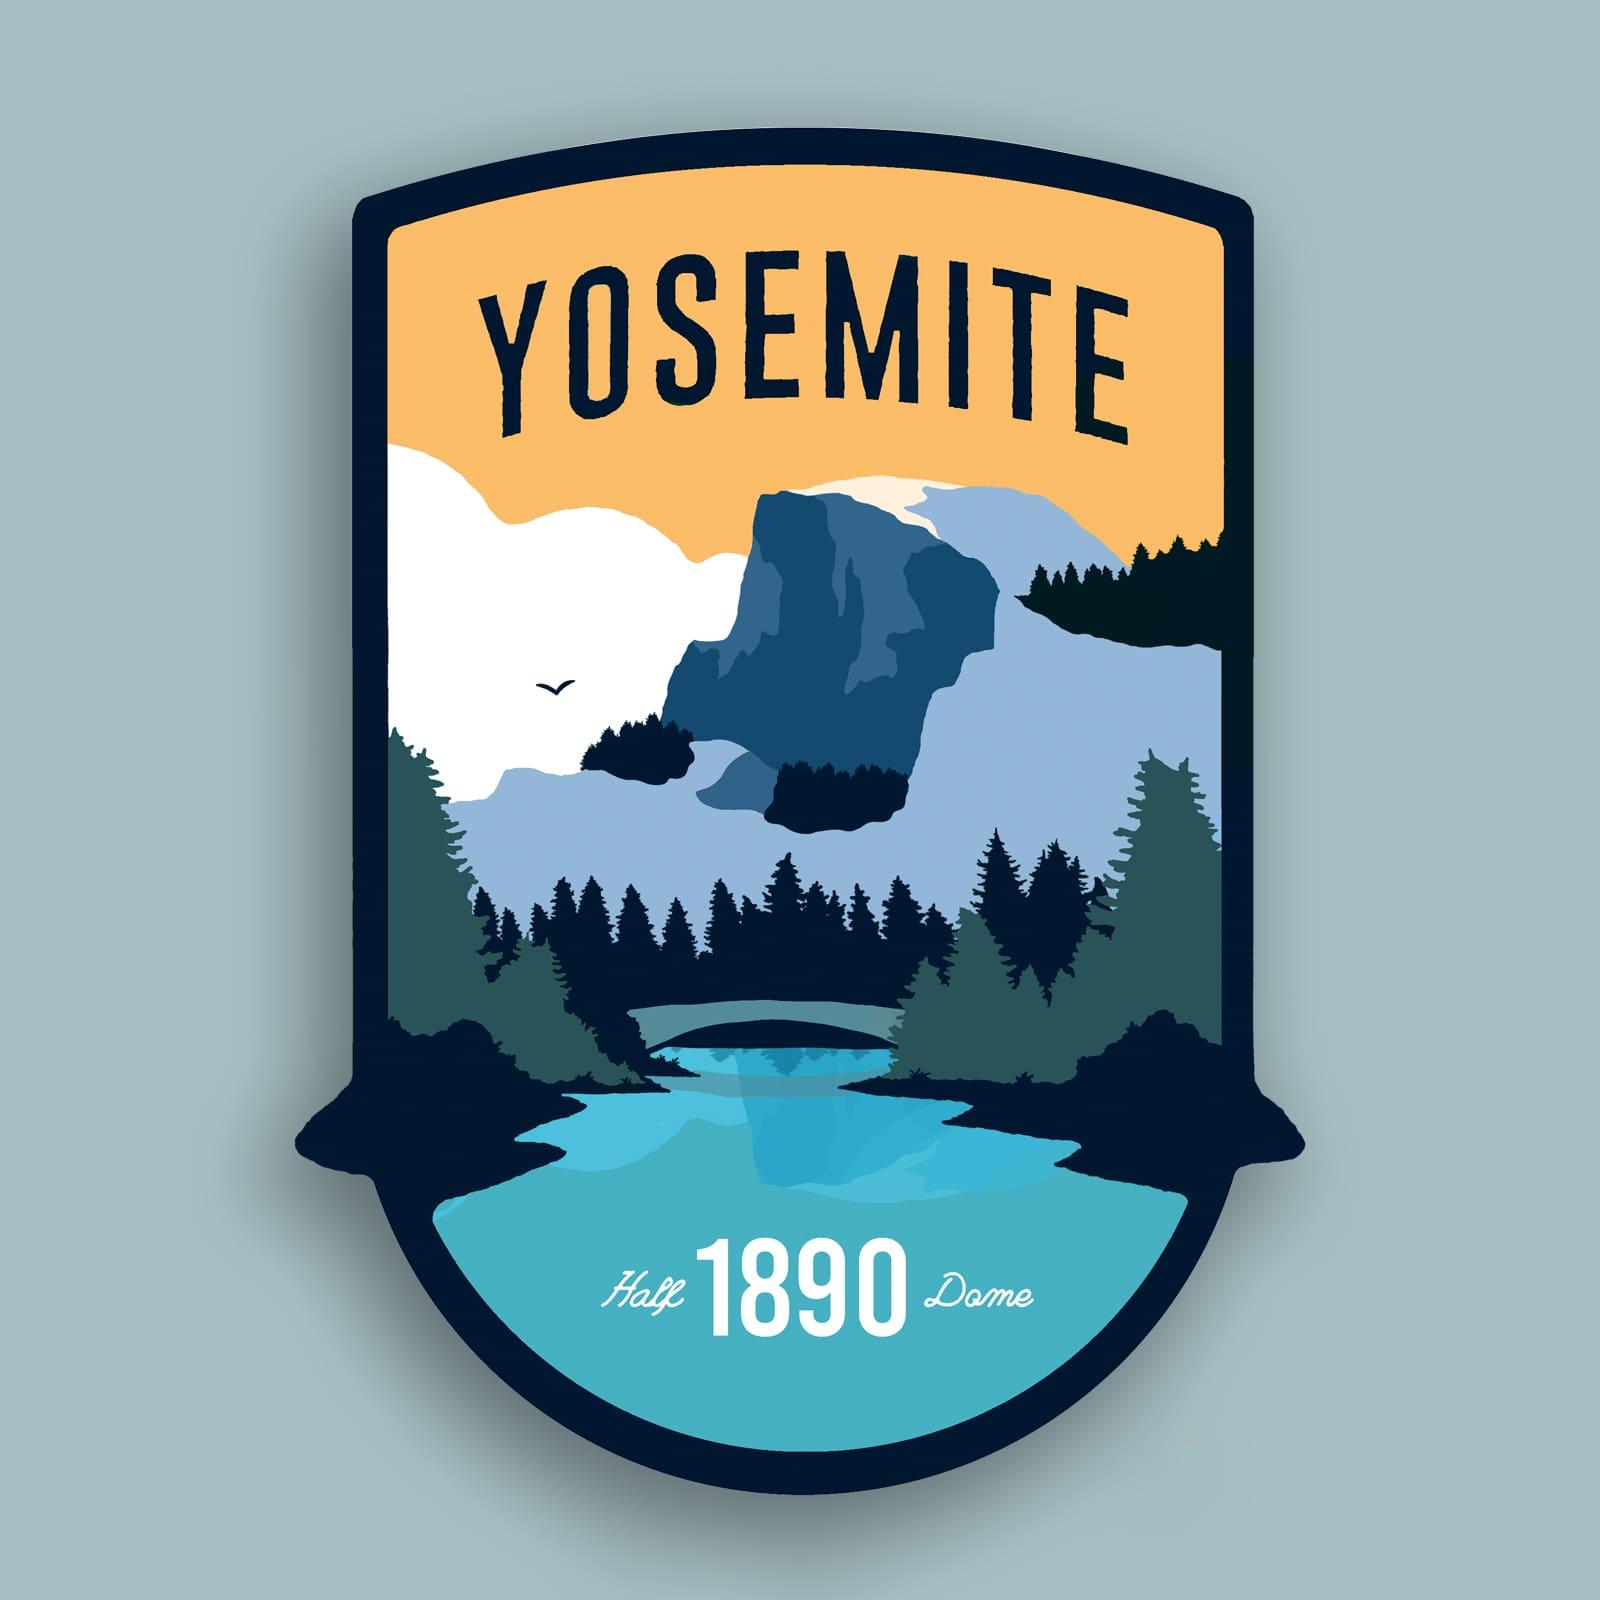 Yosemite National Park (Half Dome)